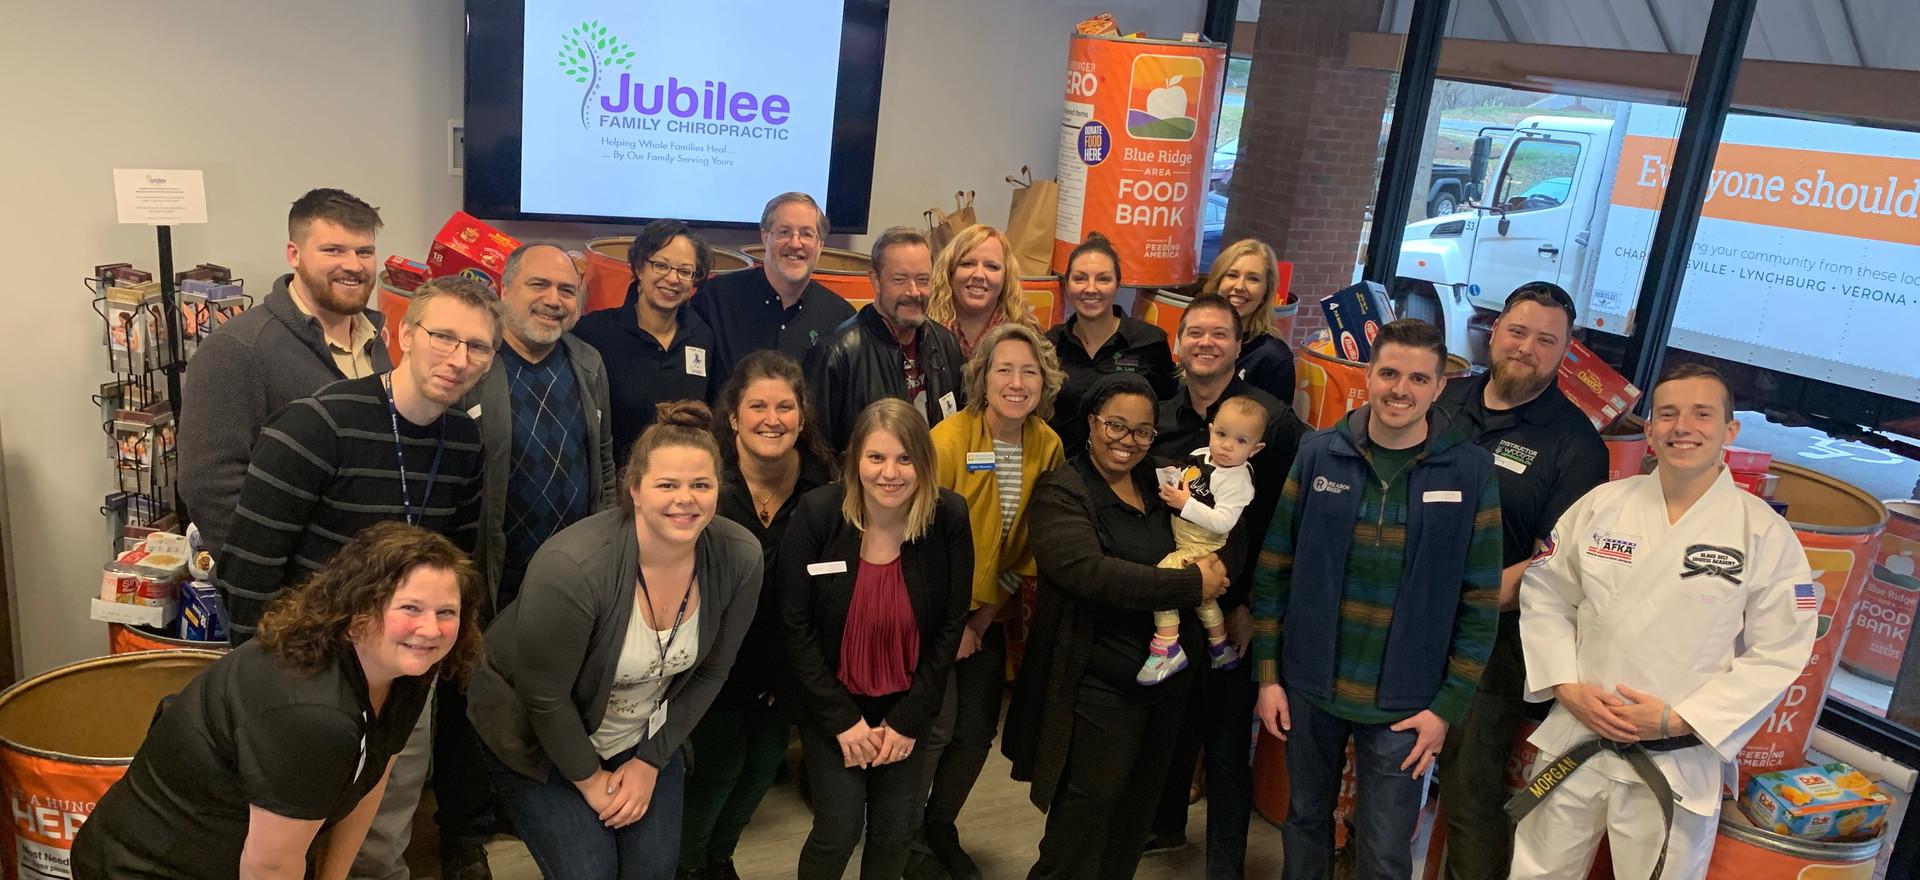 Jubilee Family Chiropractic 2020 Blue Ridge Food Drive. 002